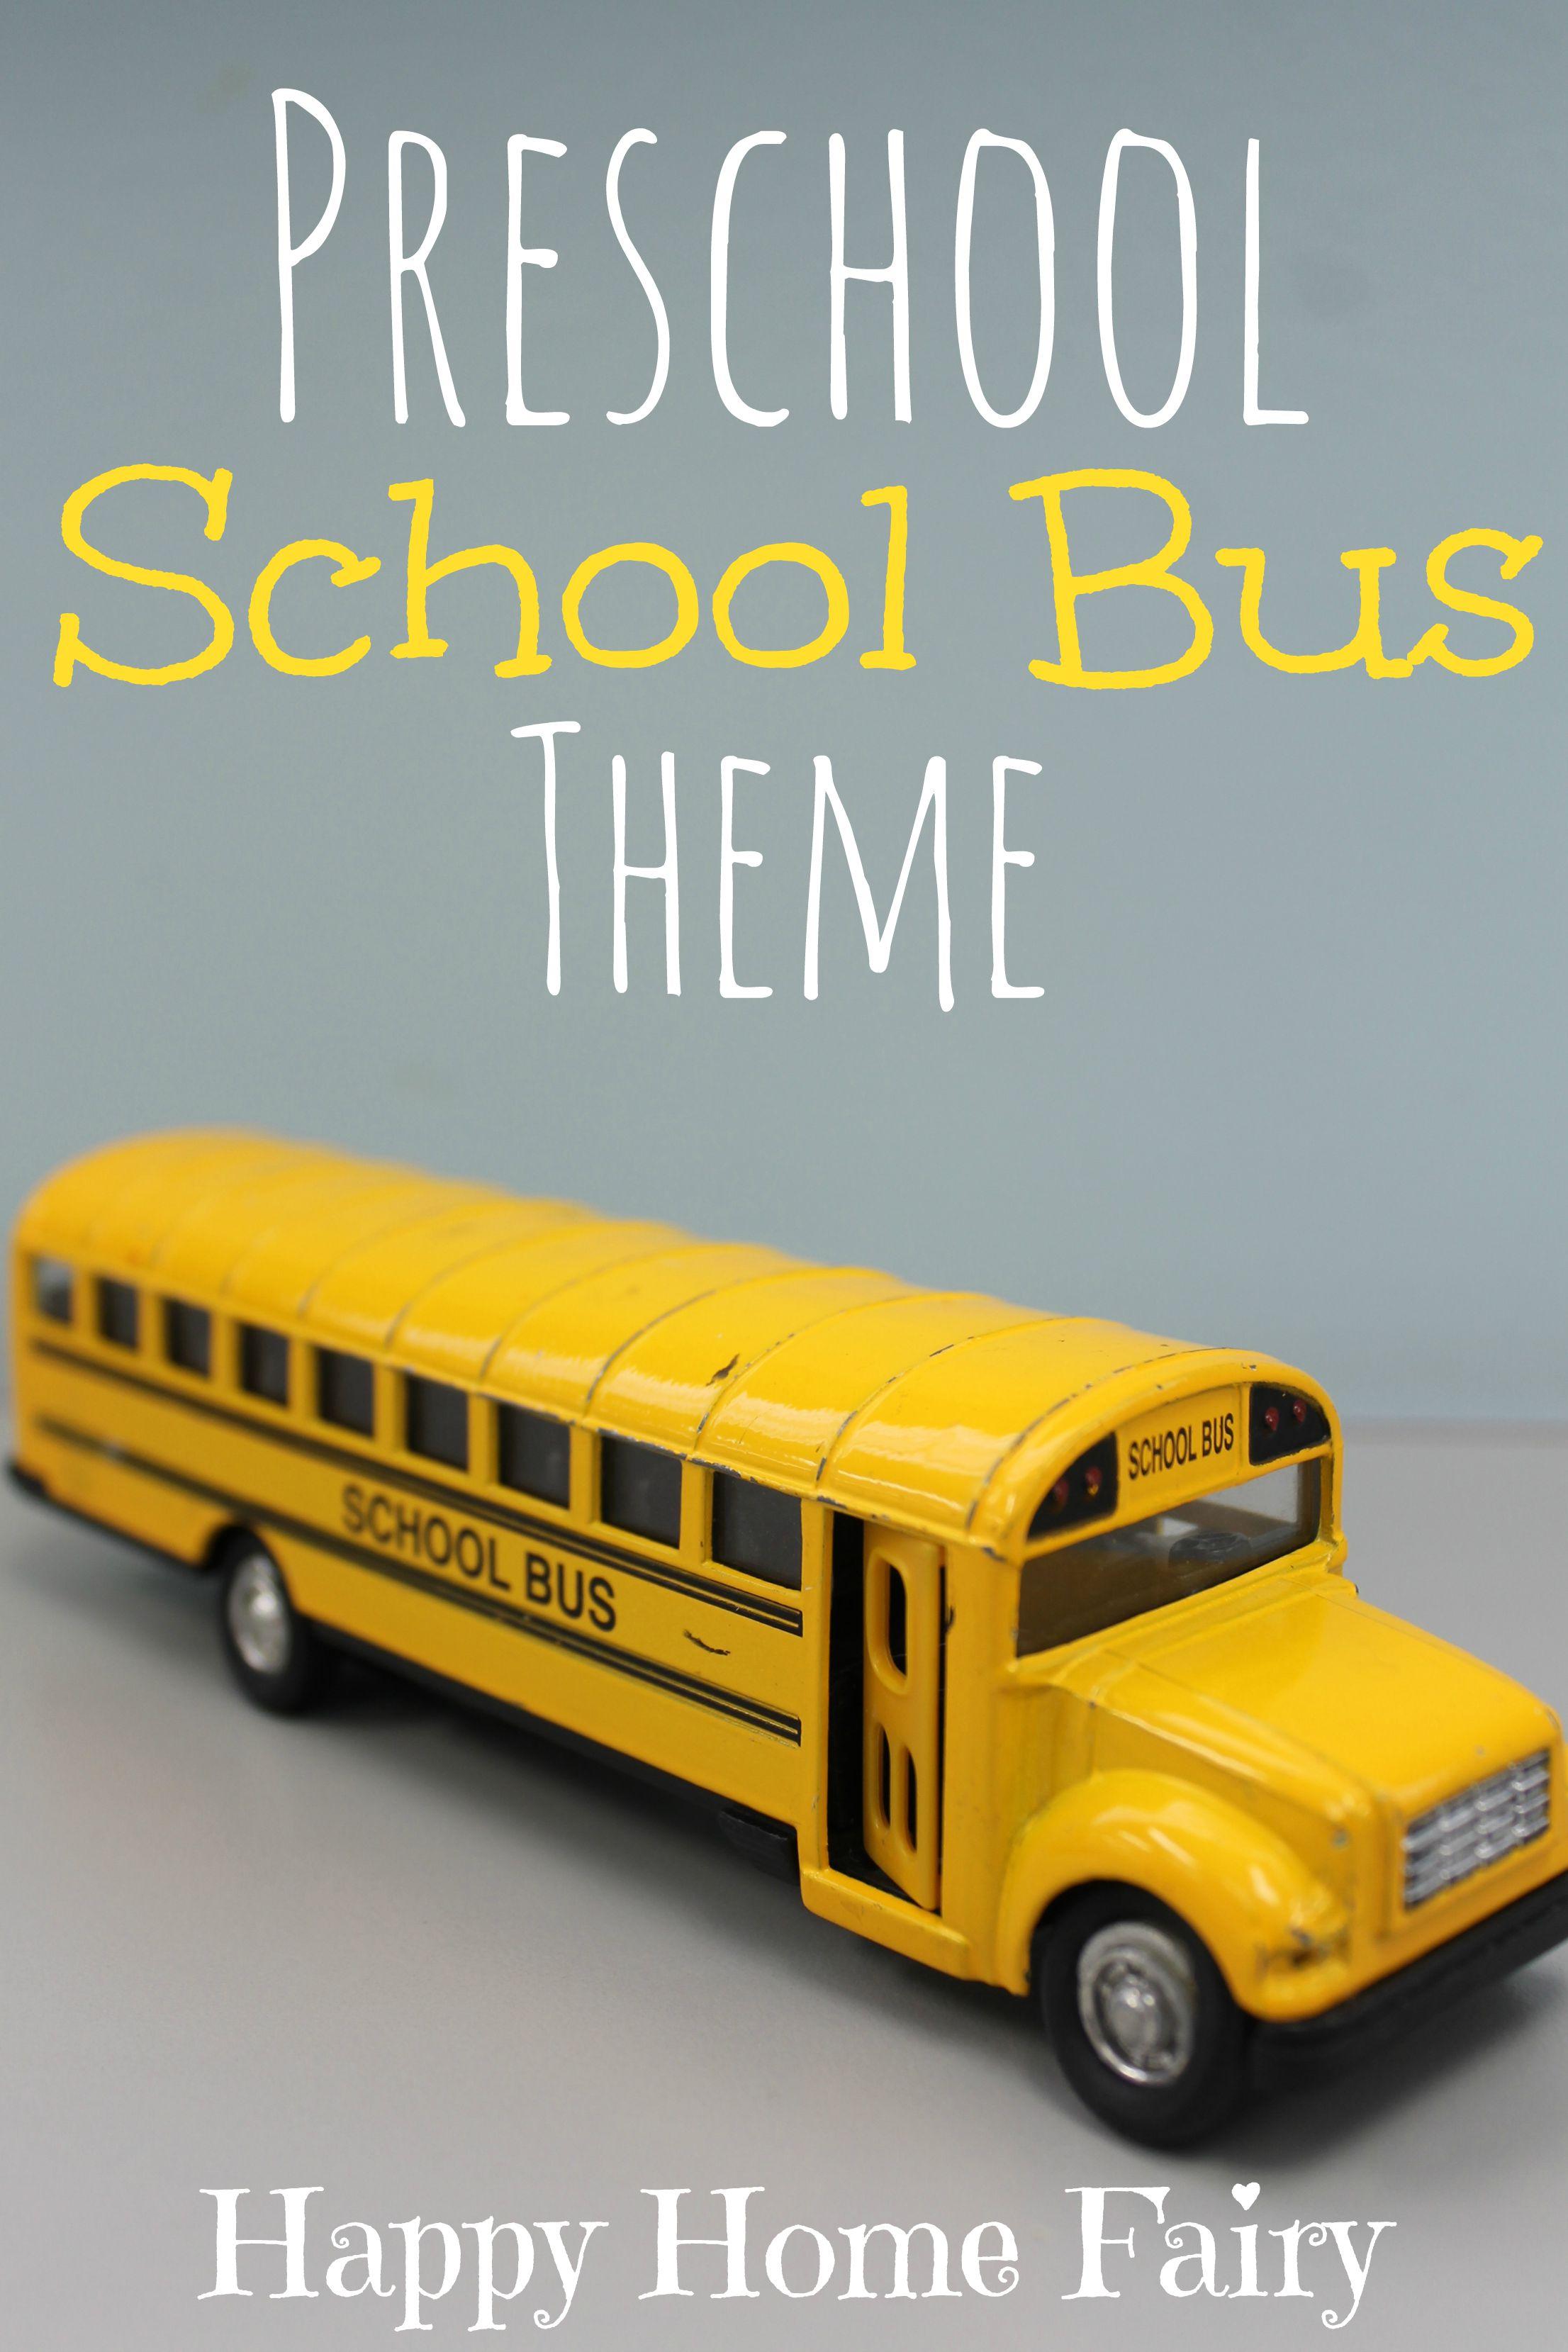 Preschool School Bus Theme